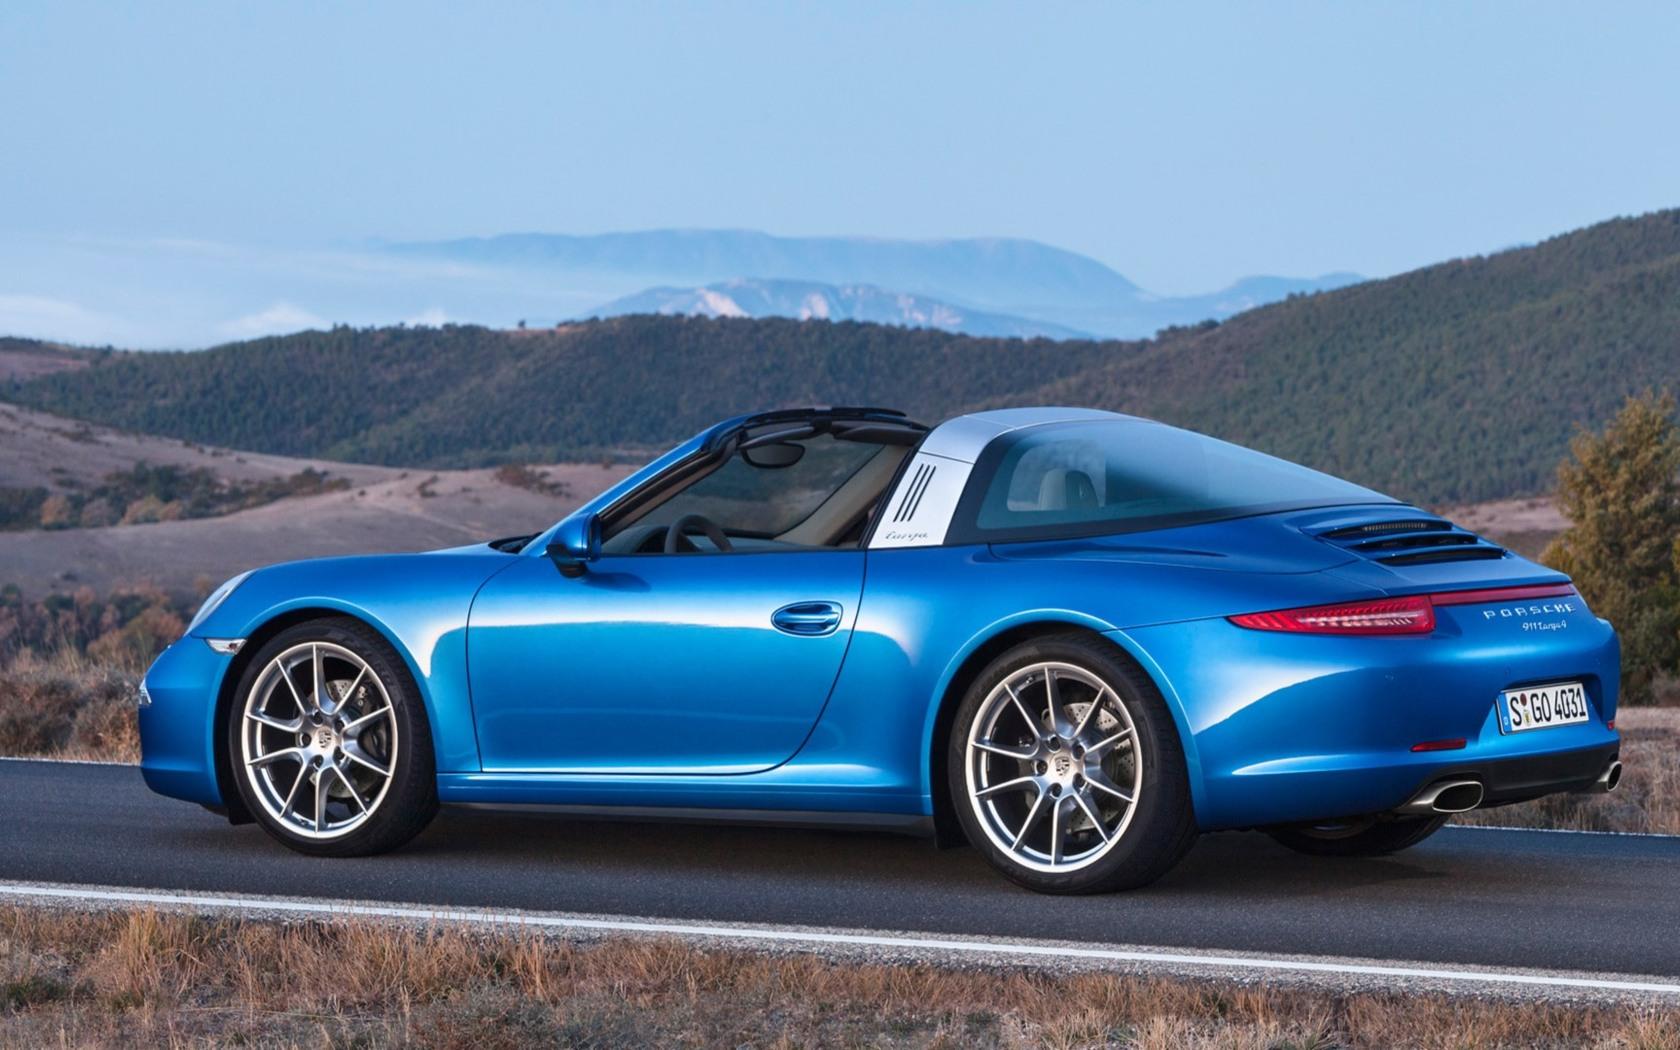 2015 Porsche 911 Targa wallpaper 33393 1680x1050